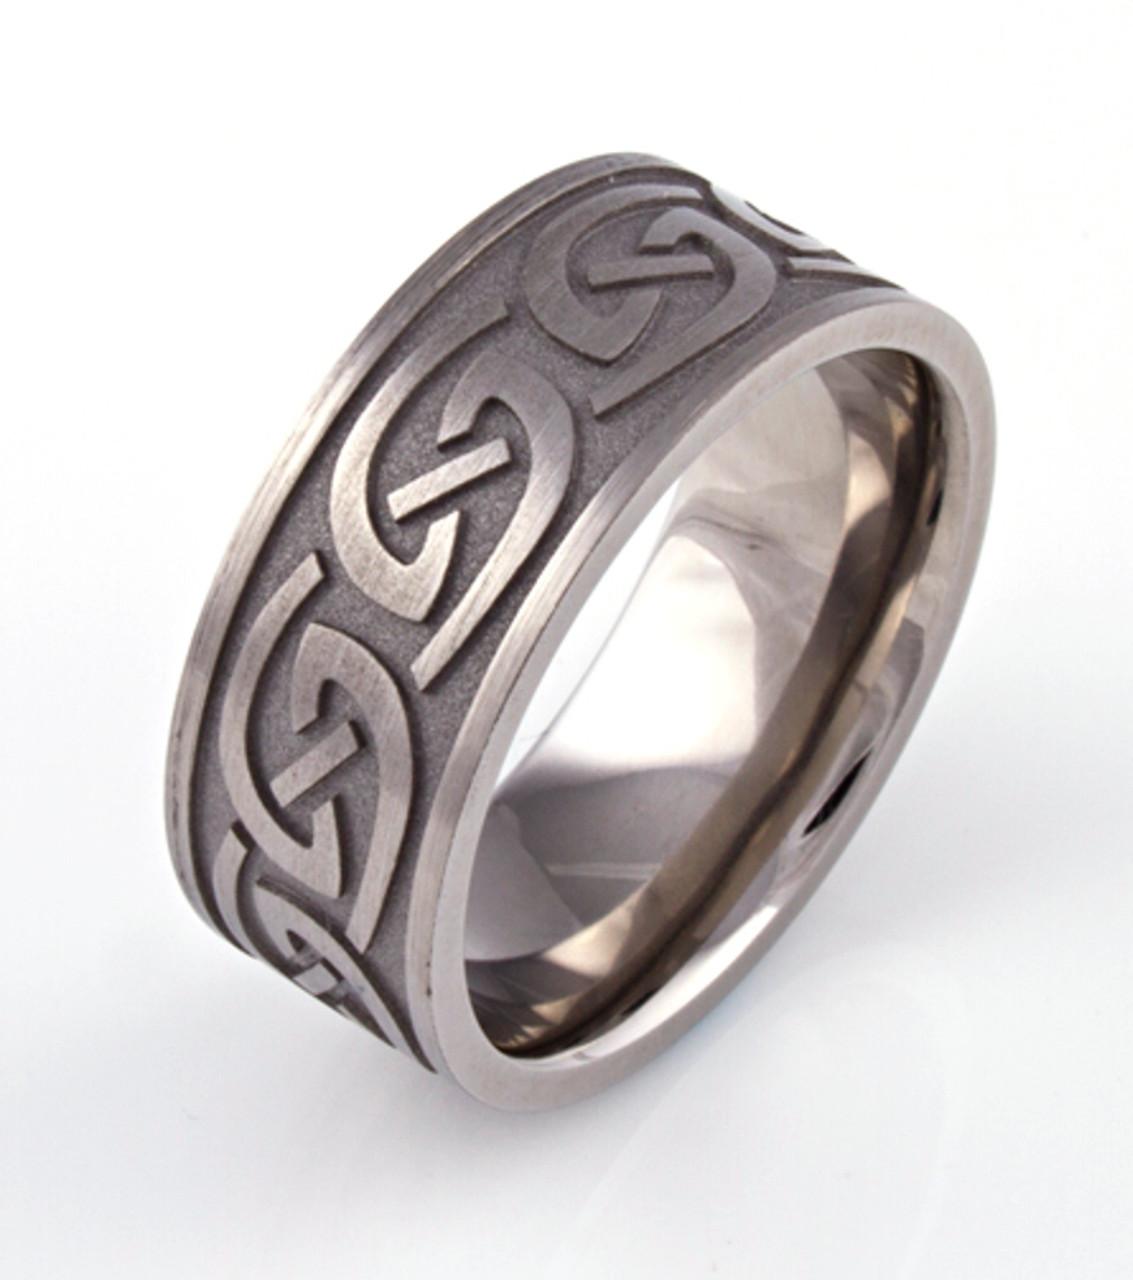 Unique carved wedding bands